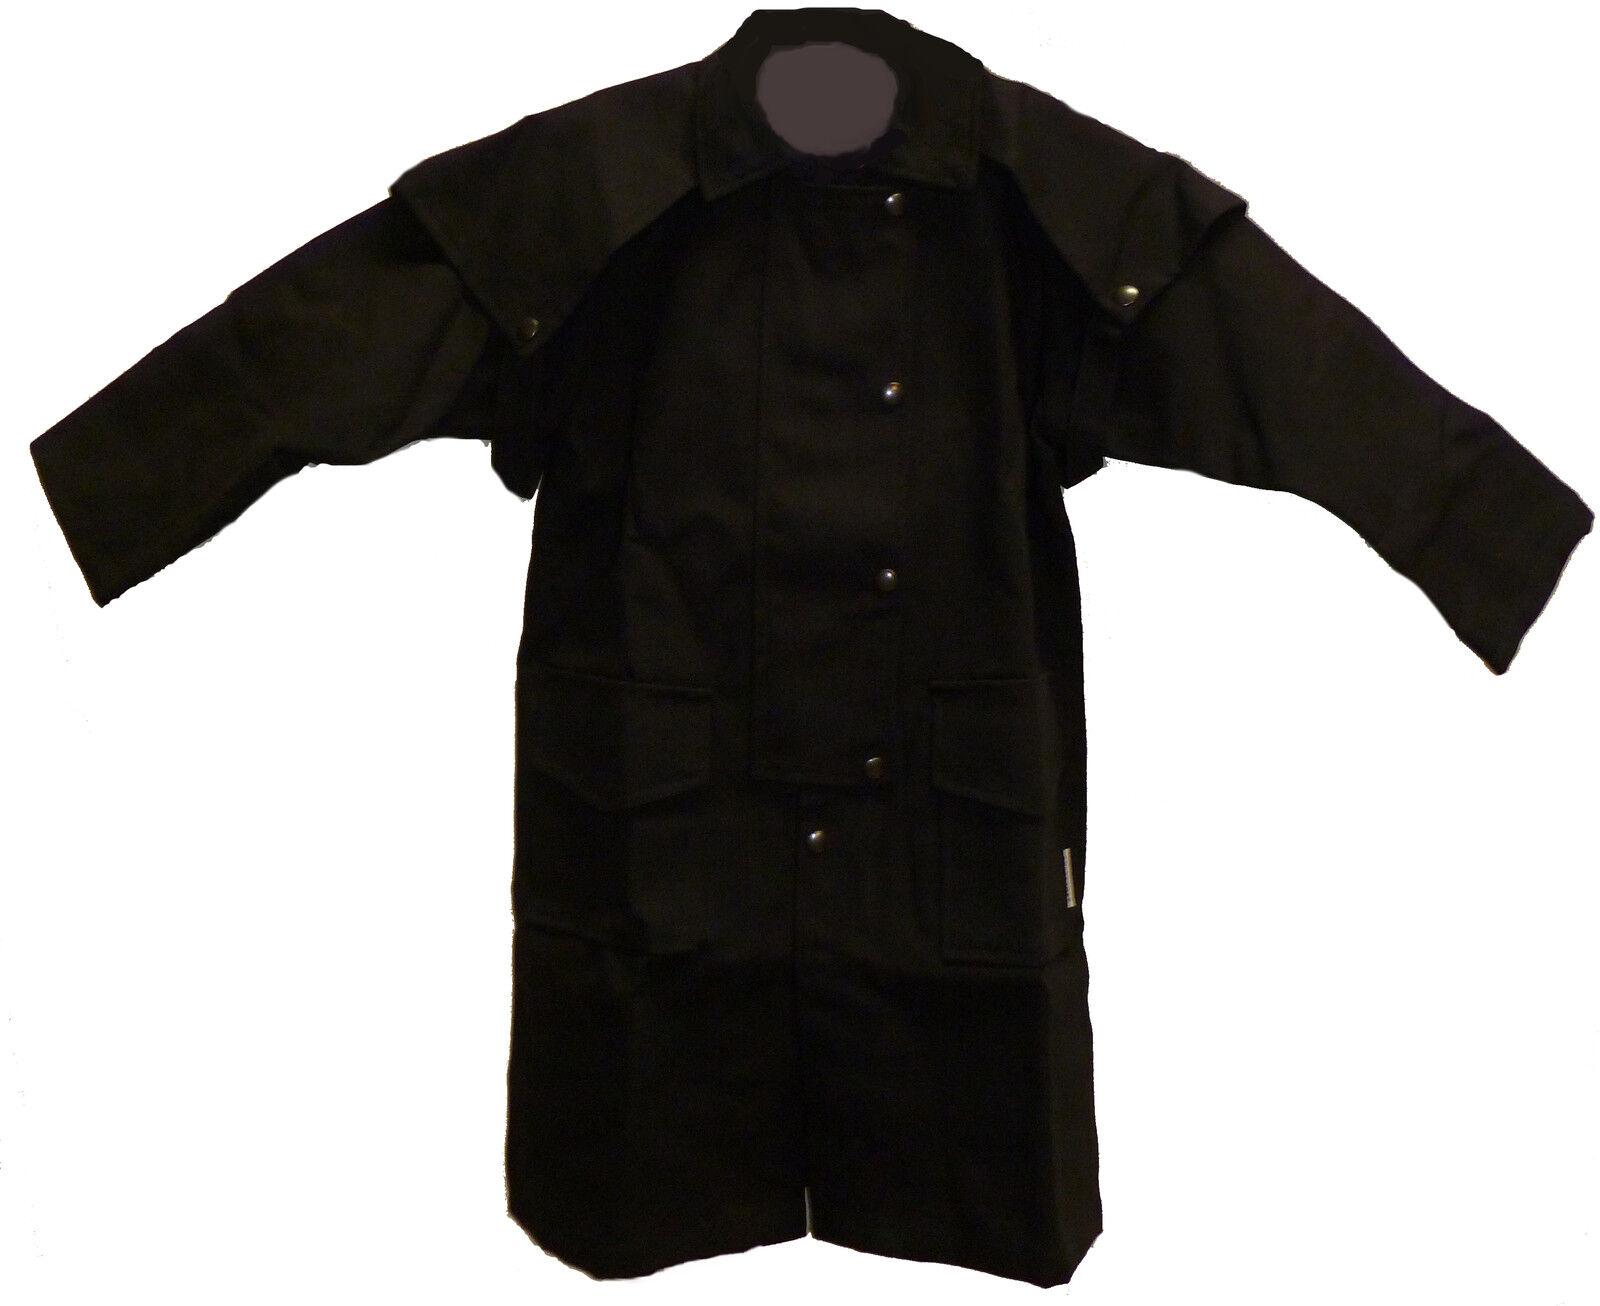 NEW CHILD'S CAPED COAT COWBOY DUSTER SADDLE COAT CAPED 9f06d1